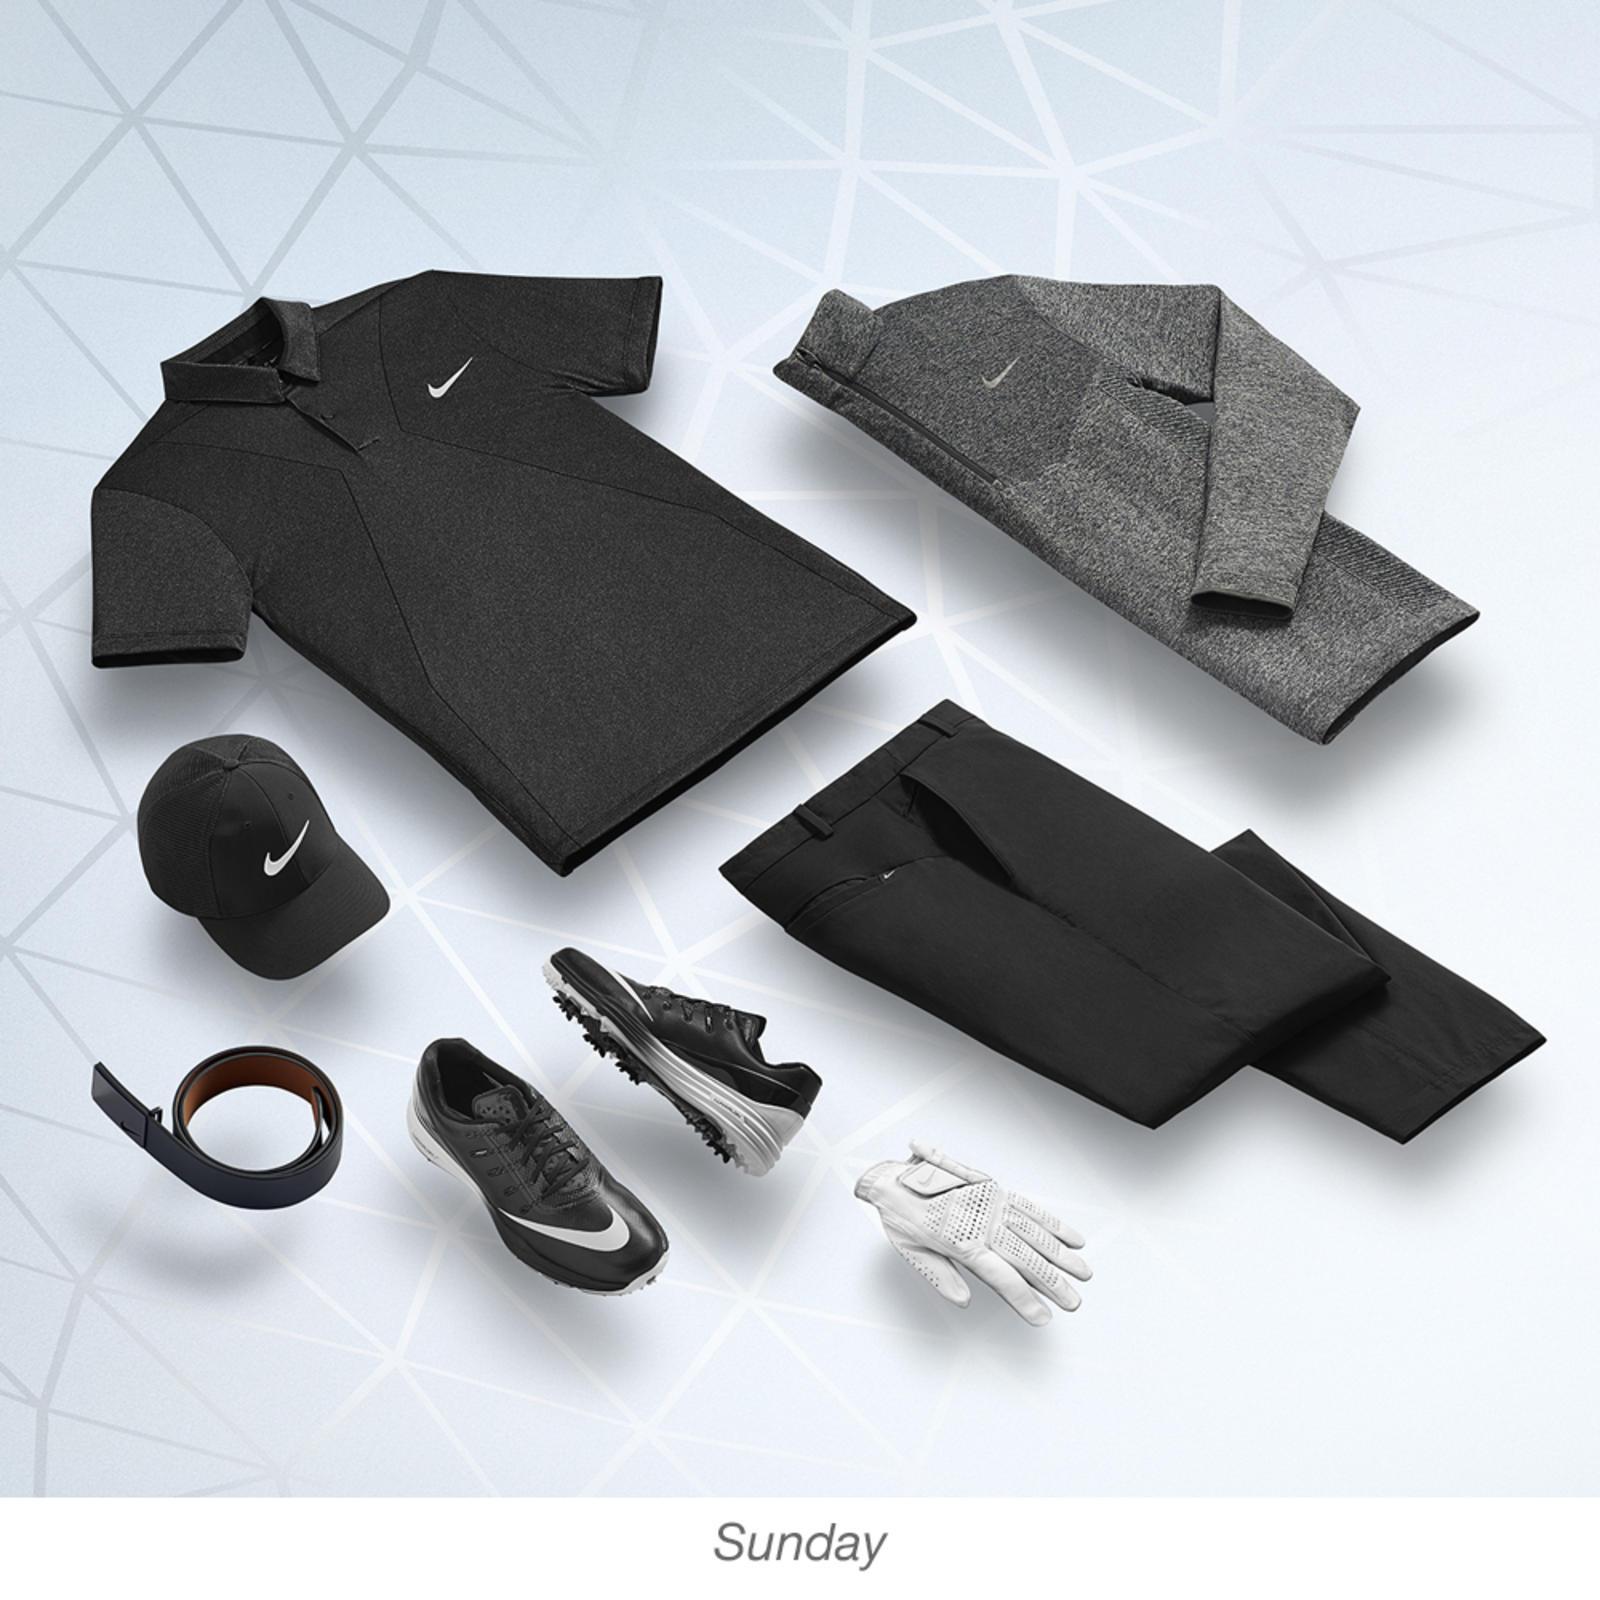 Schwartzel_MASTERS_Sunday